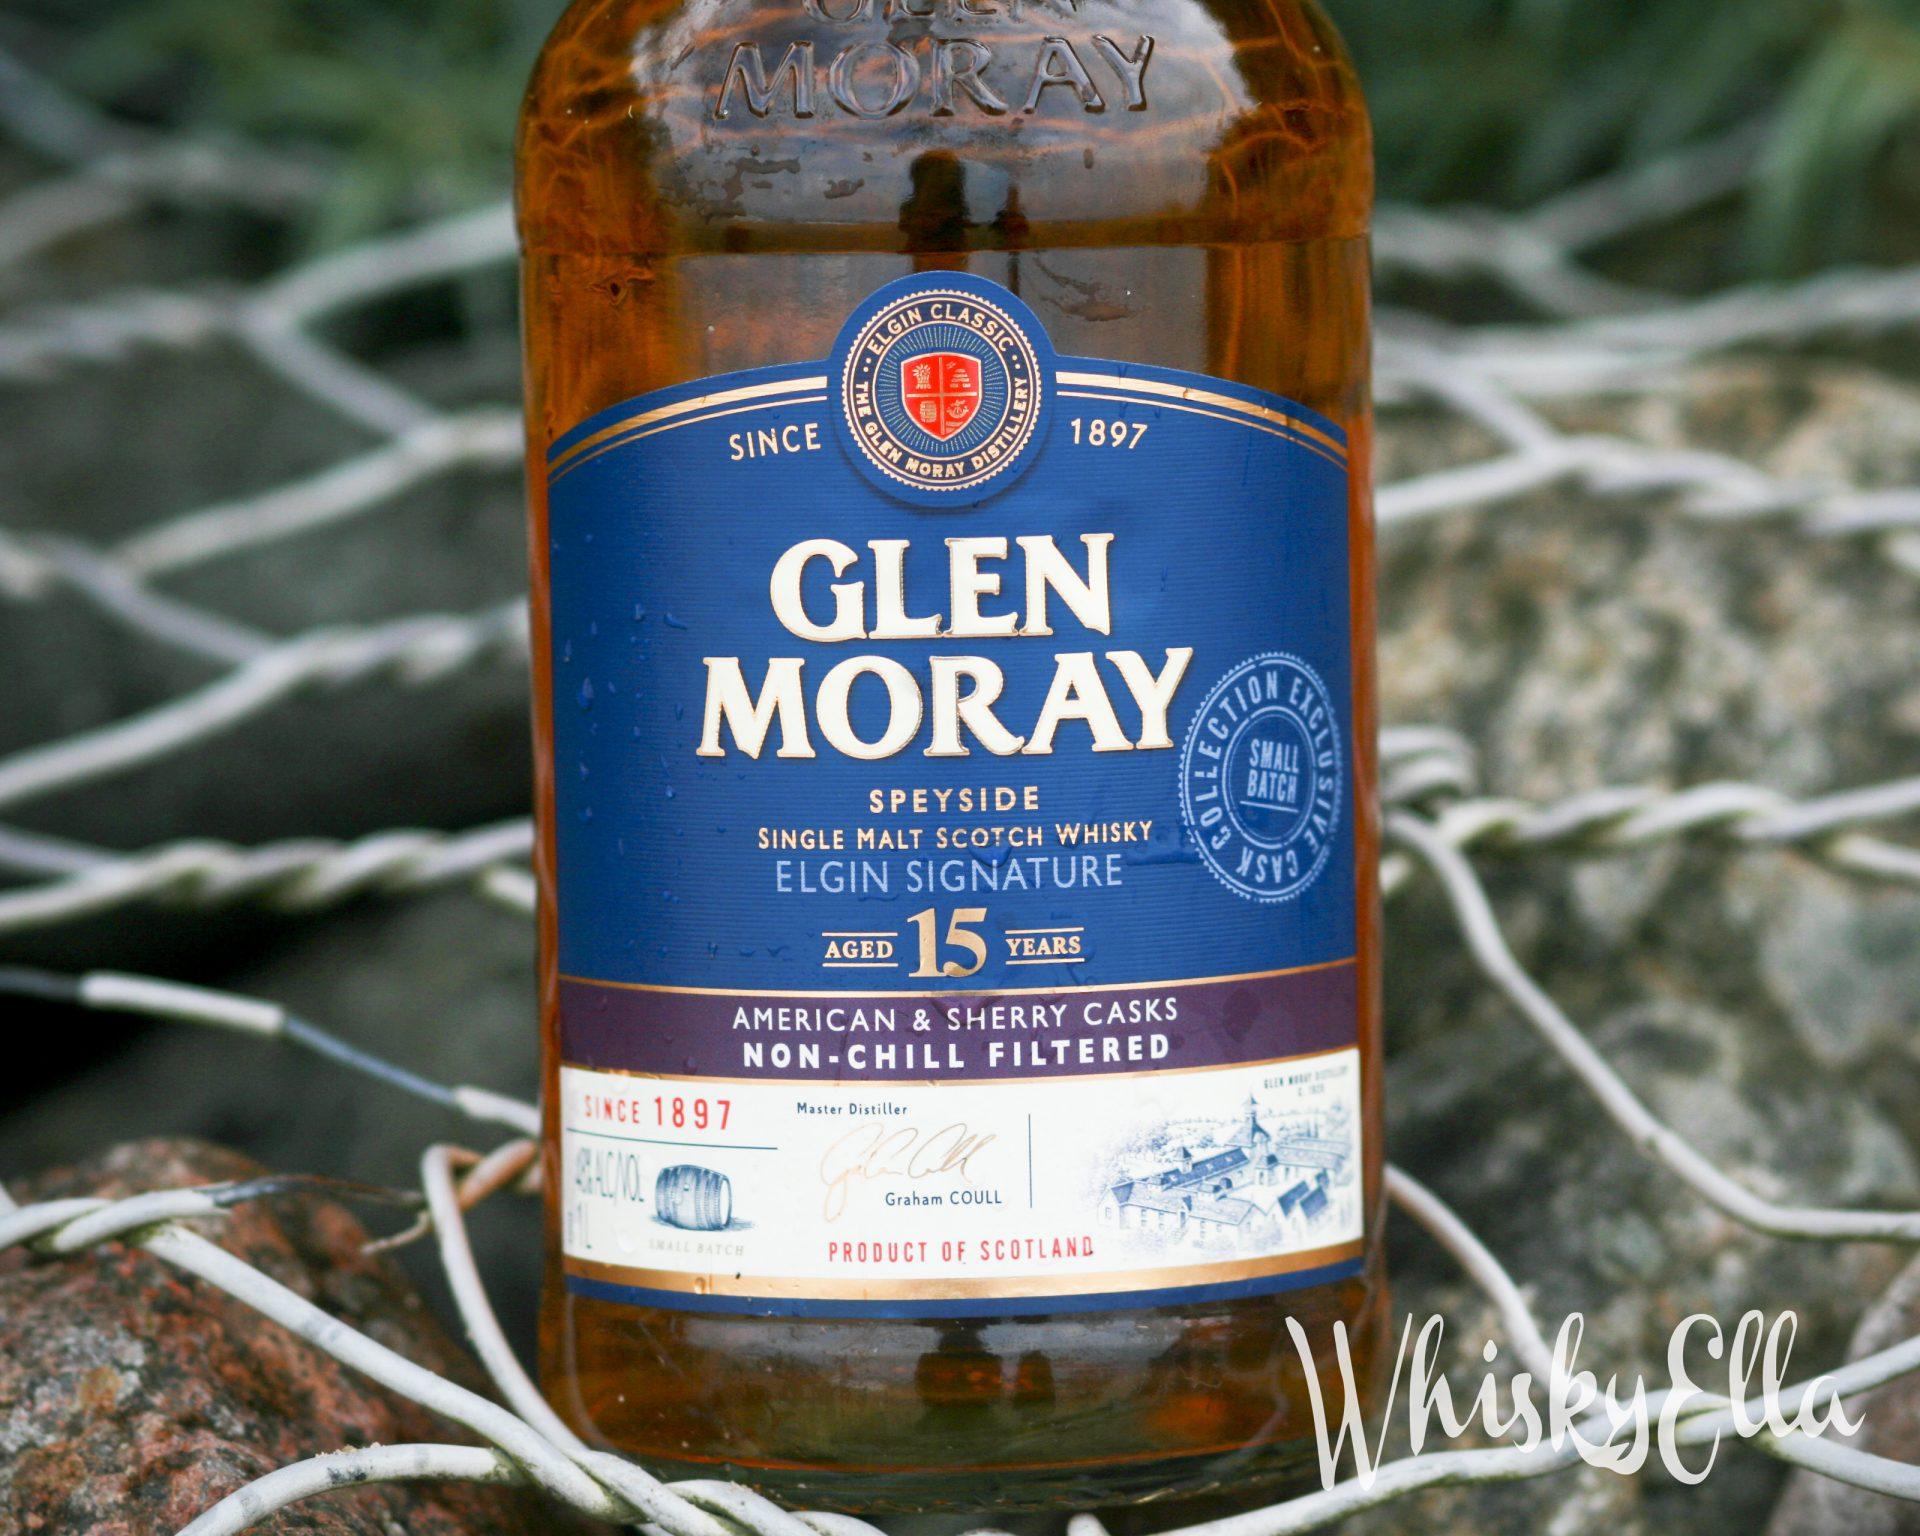 Nasza recenzja Glen Moray 15yo Elgin Signature American & Sherry #116